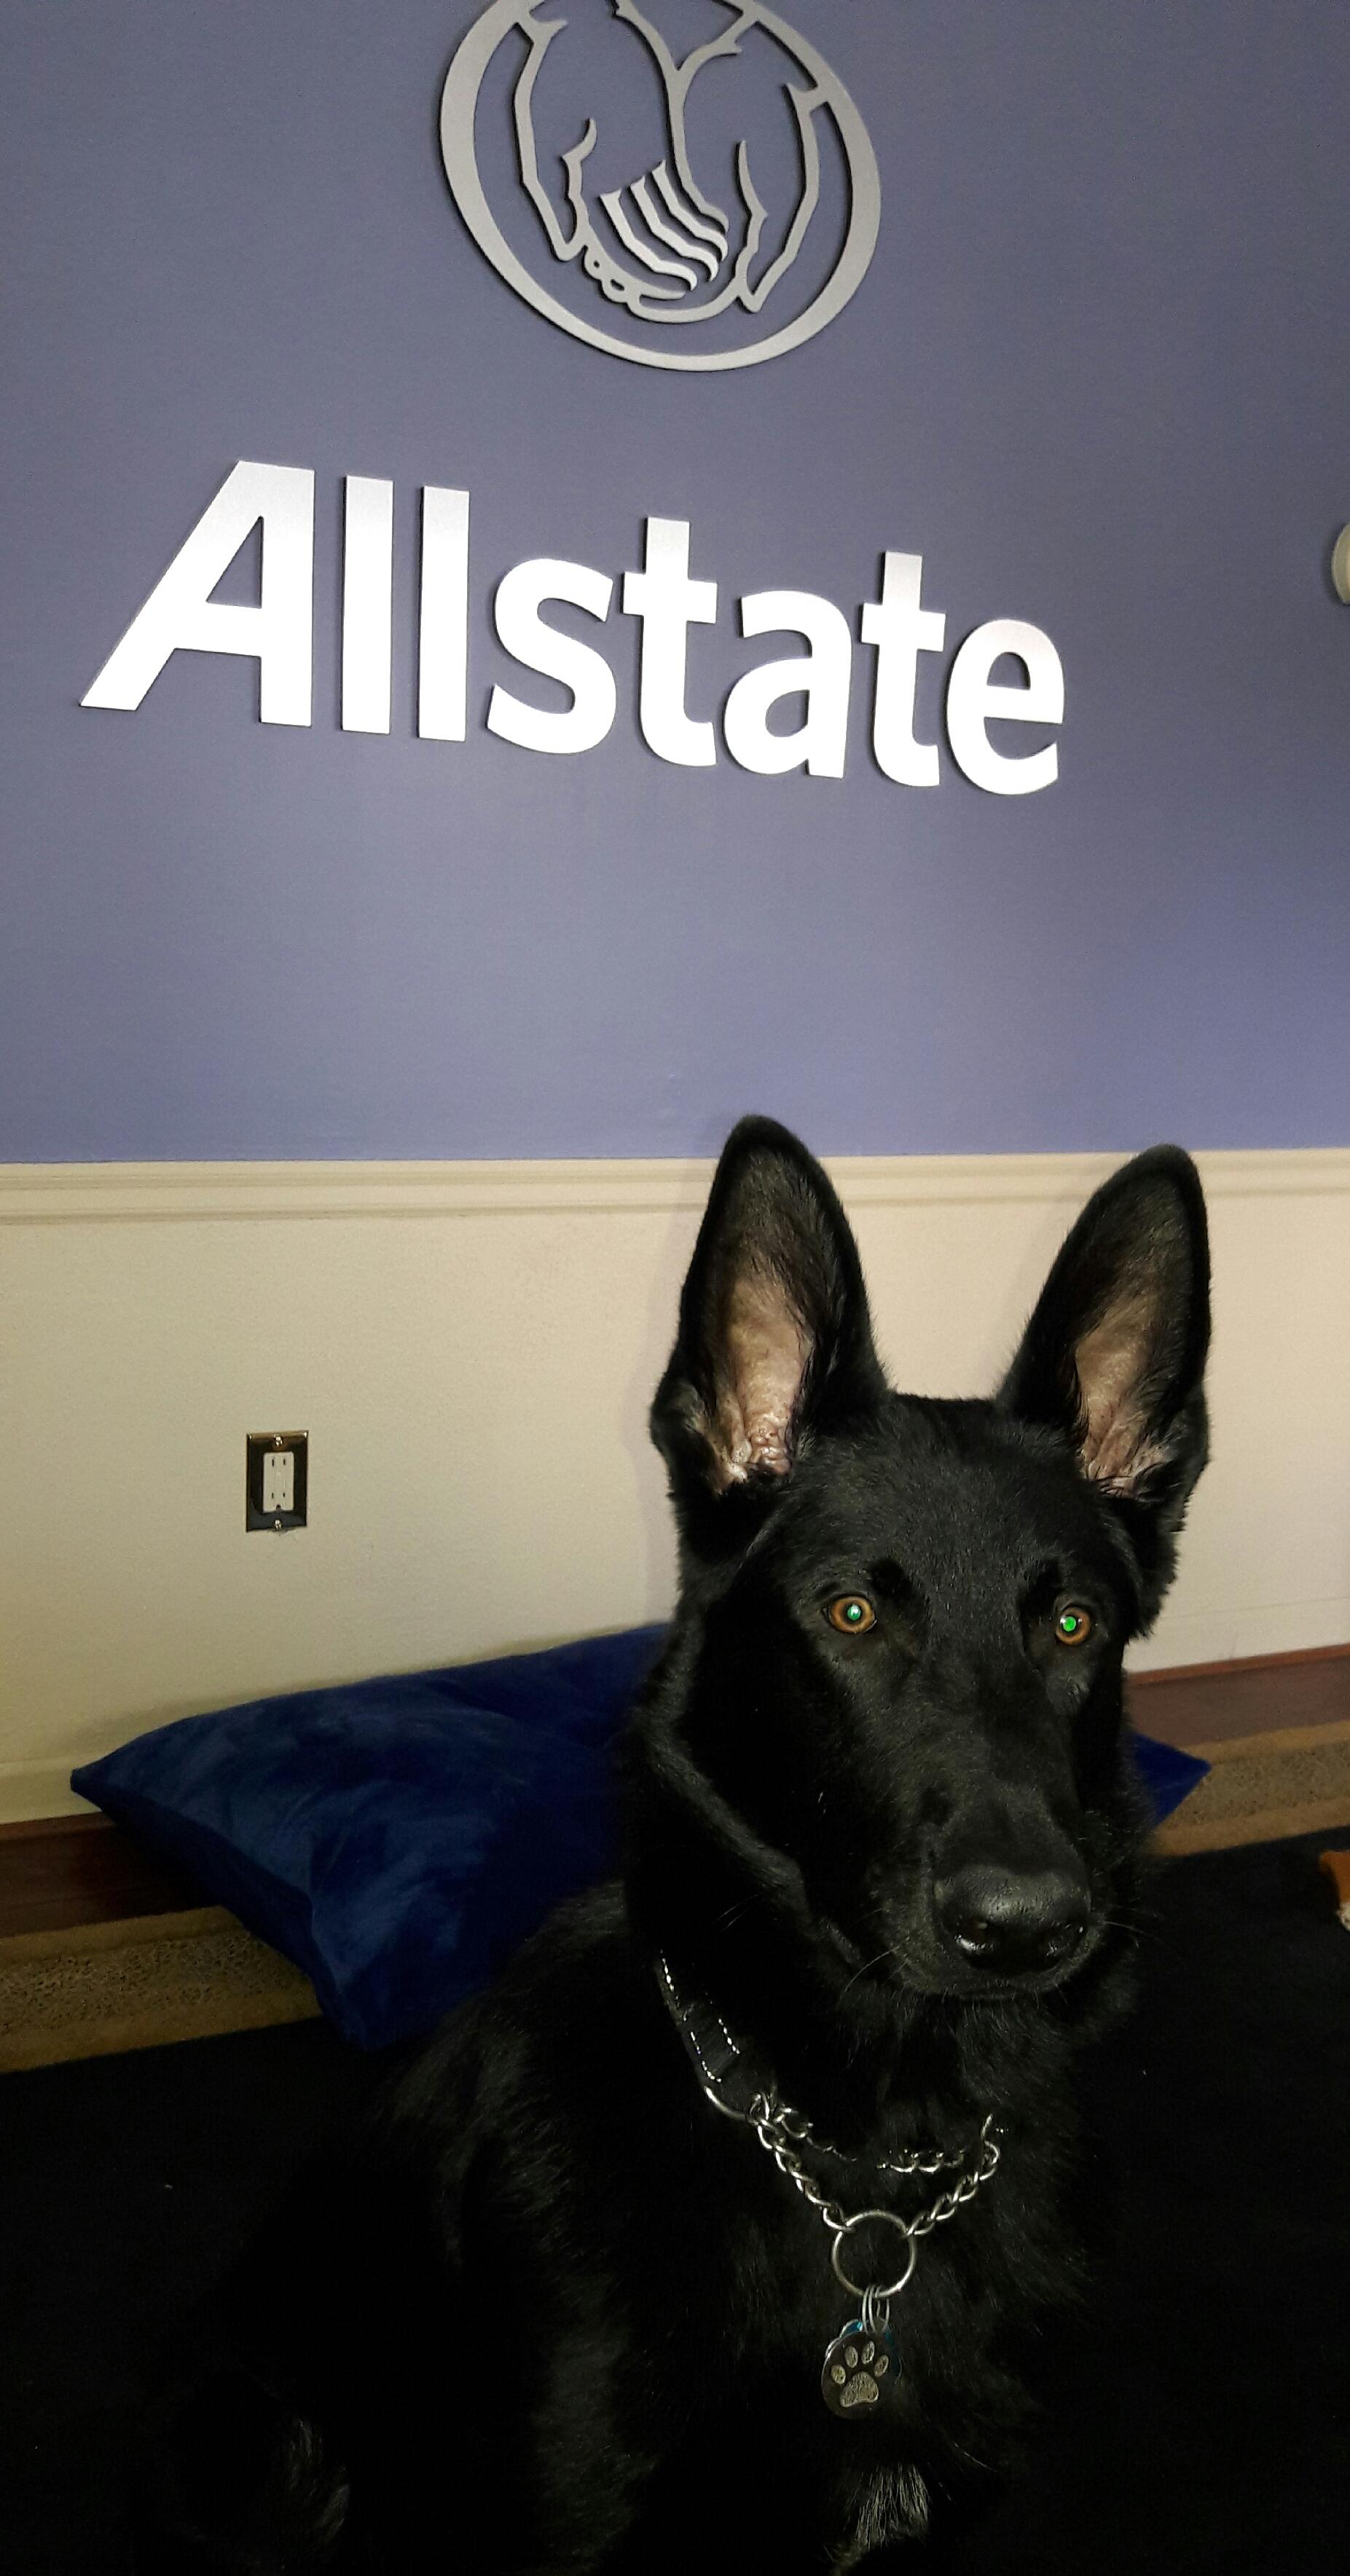 Julia Miller: Allstate Insurance image 2